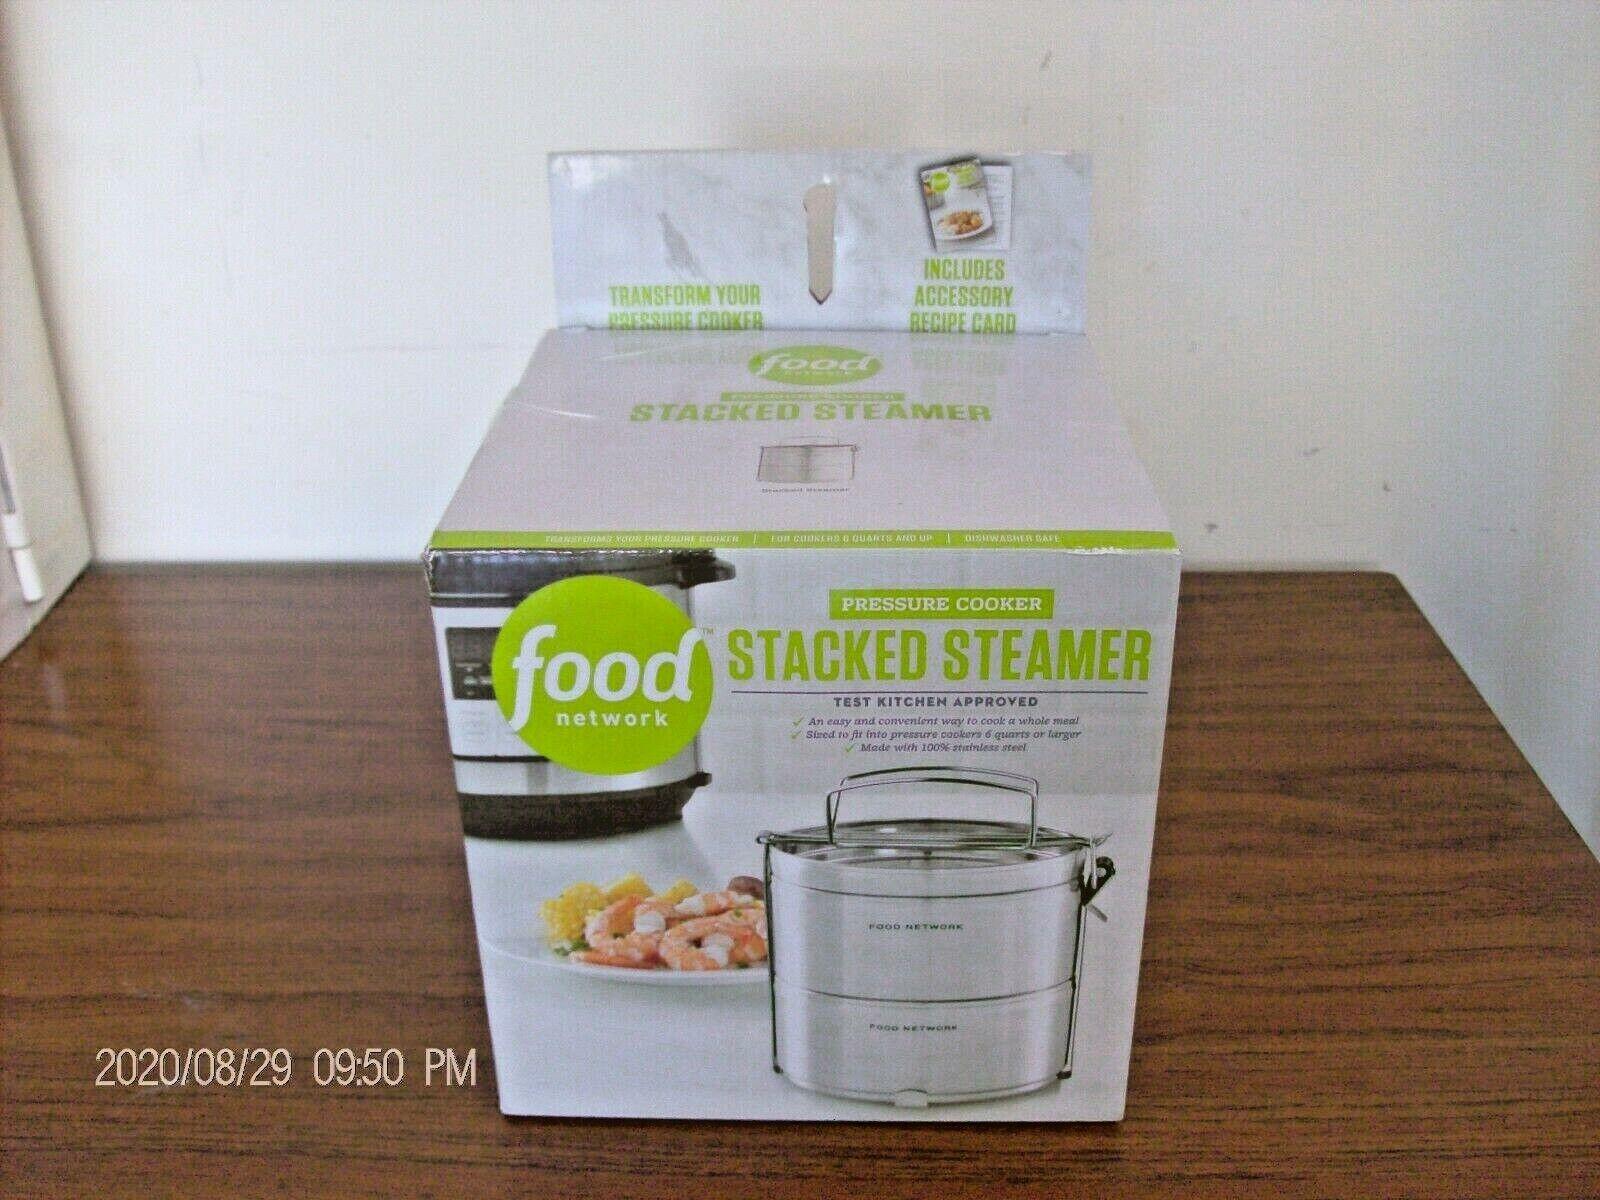 Food Network Pressure Cooker STACKED STEAMER